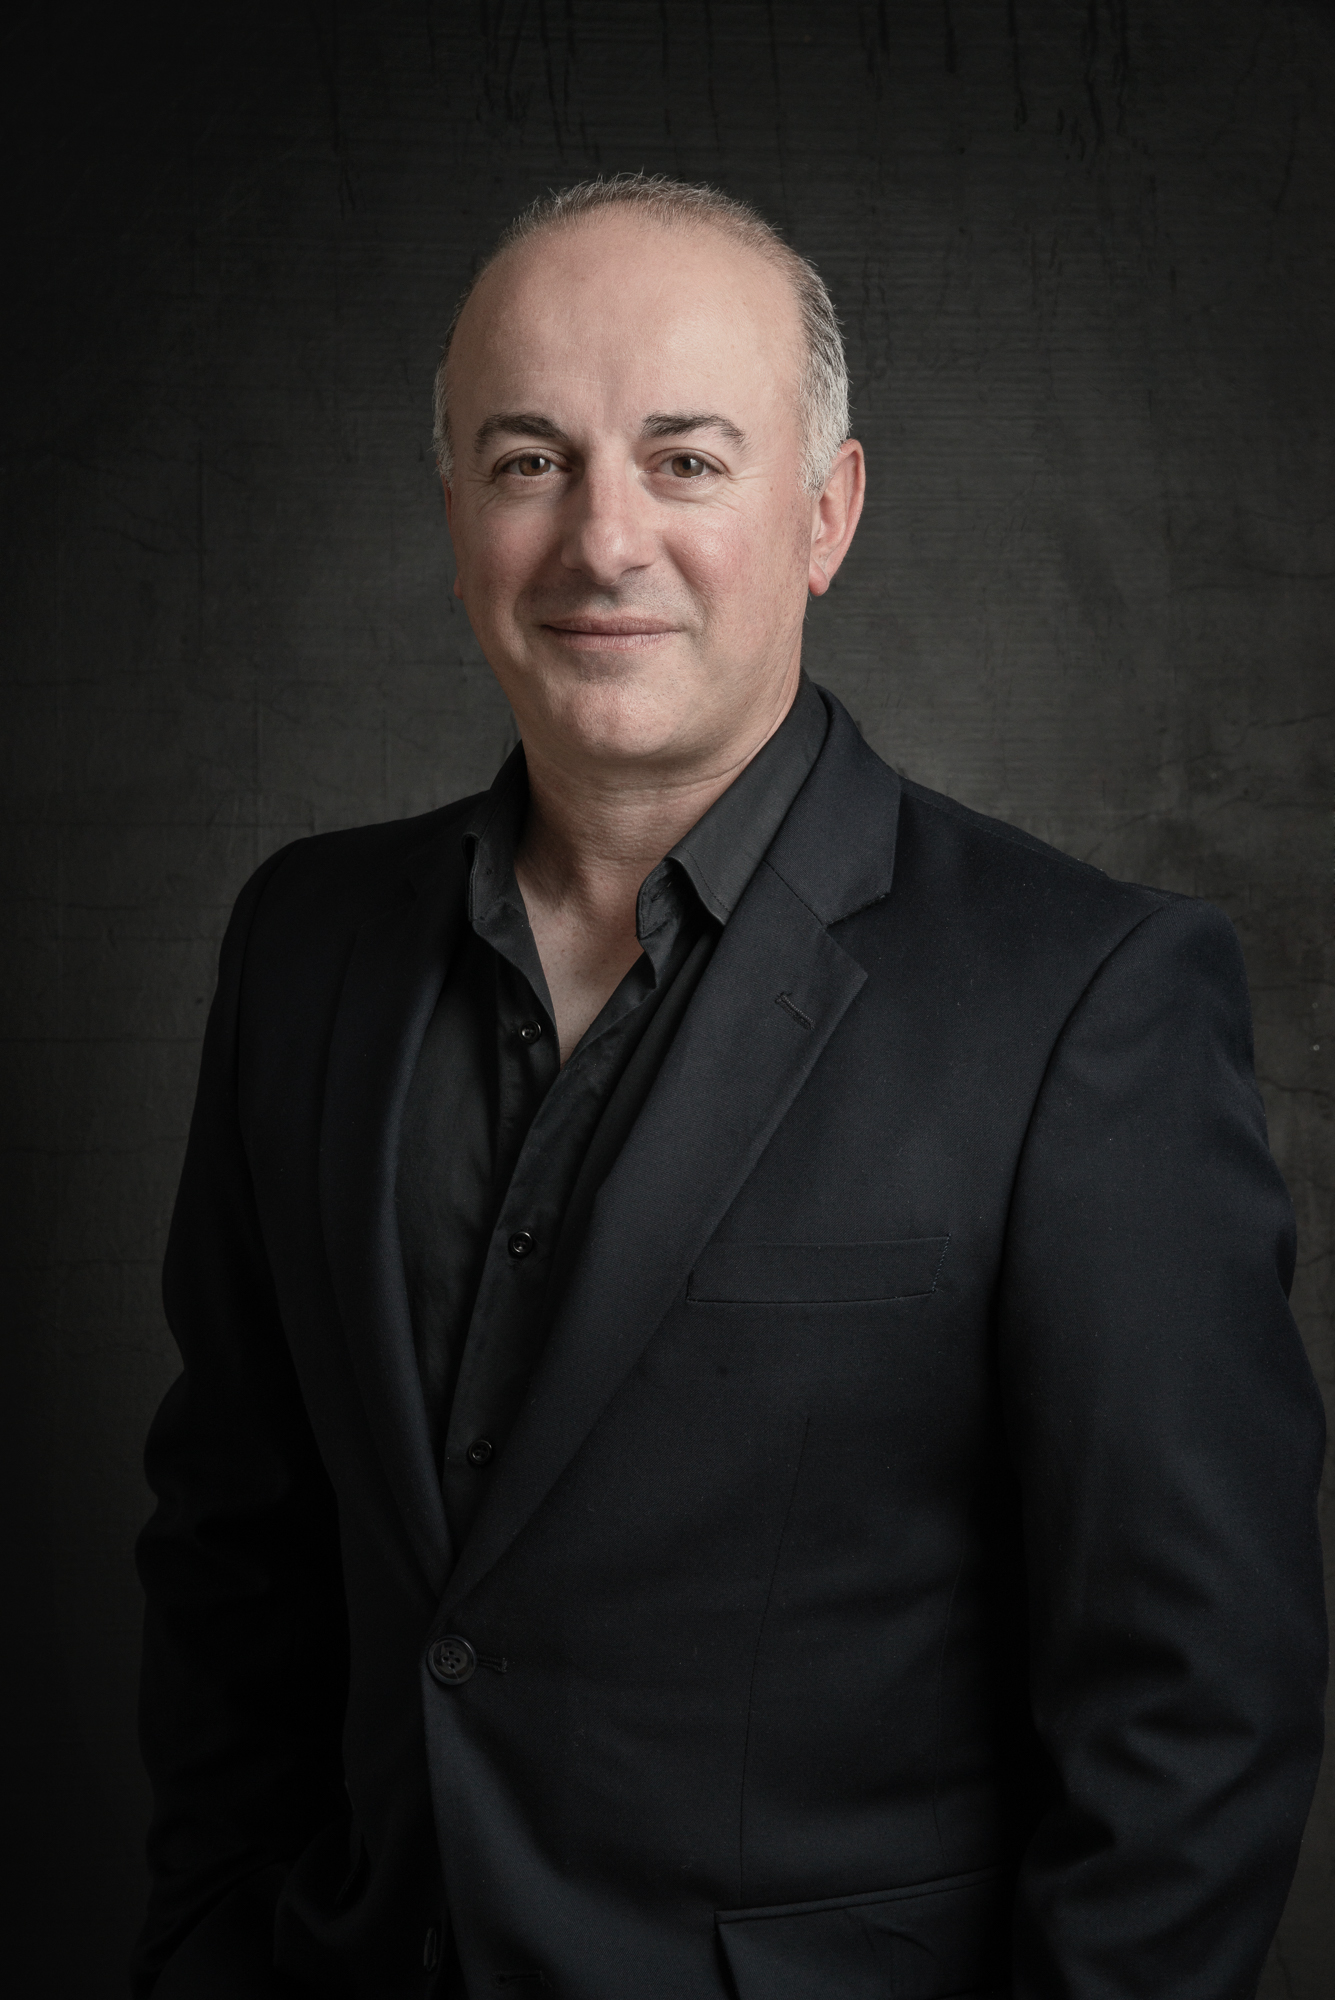 Headshots - Executive Portraits & Personal Branding